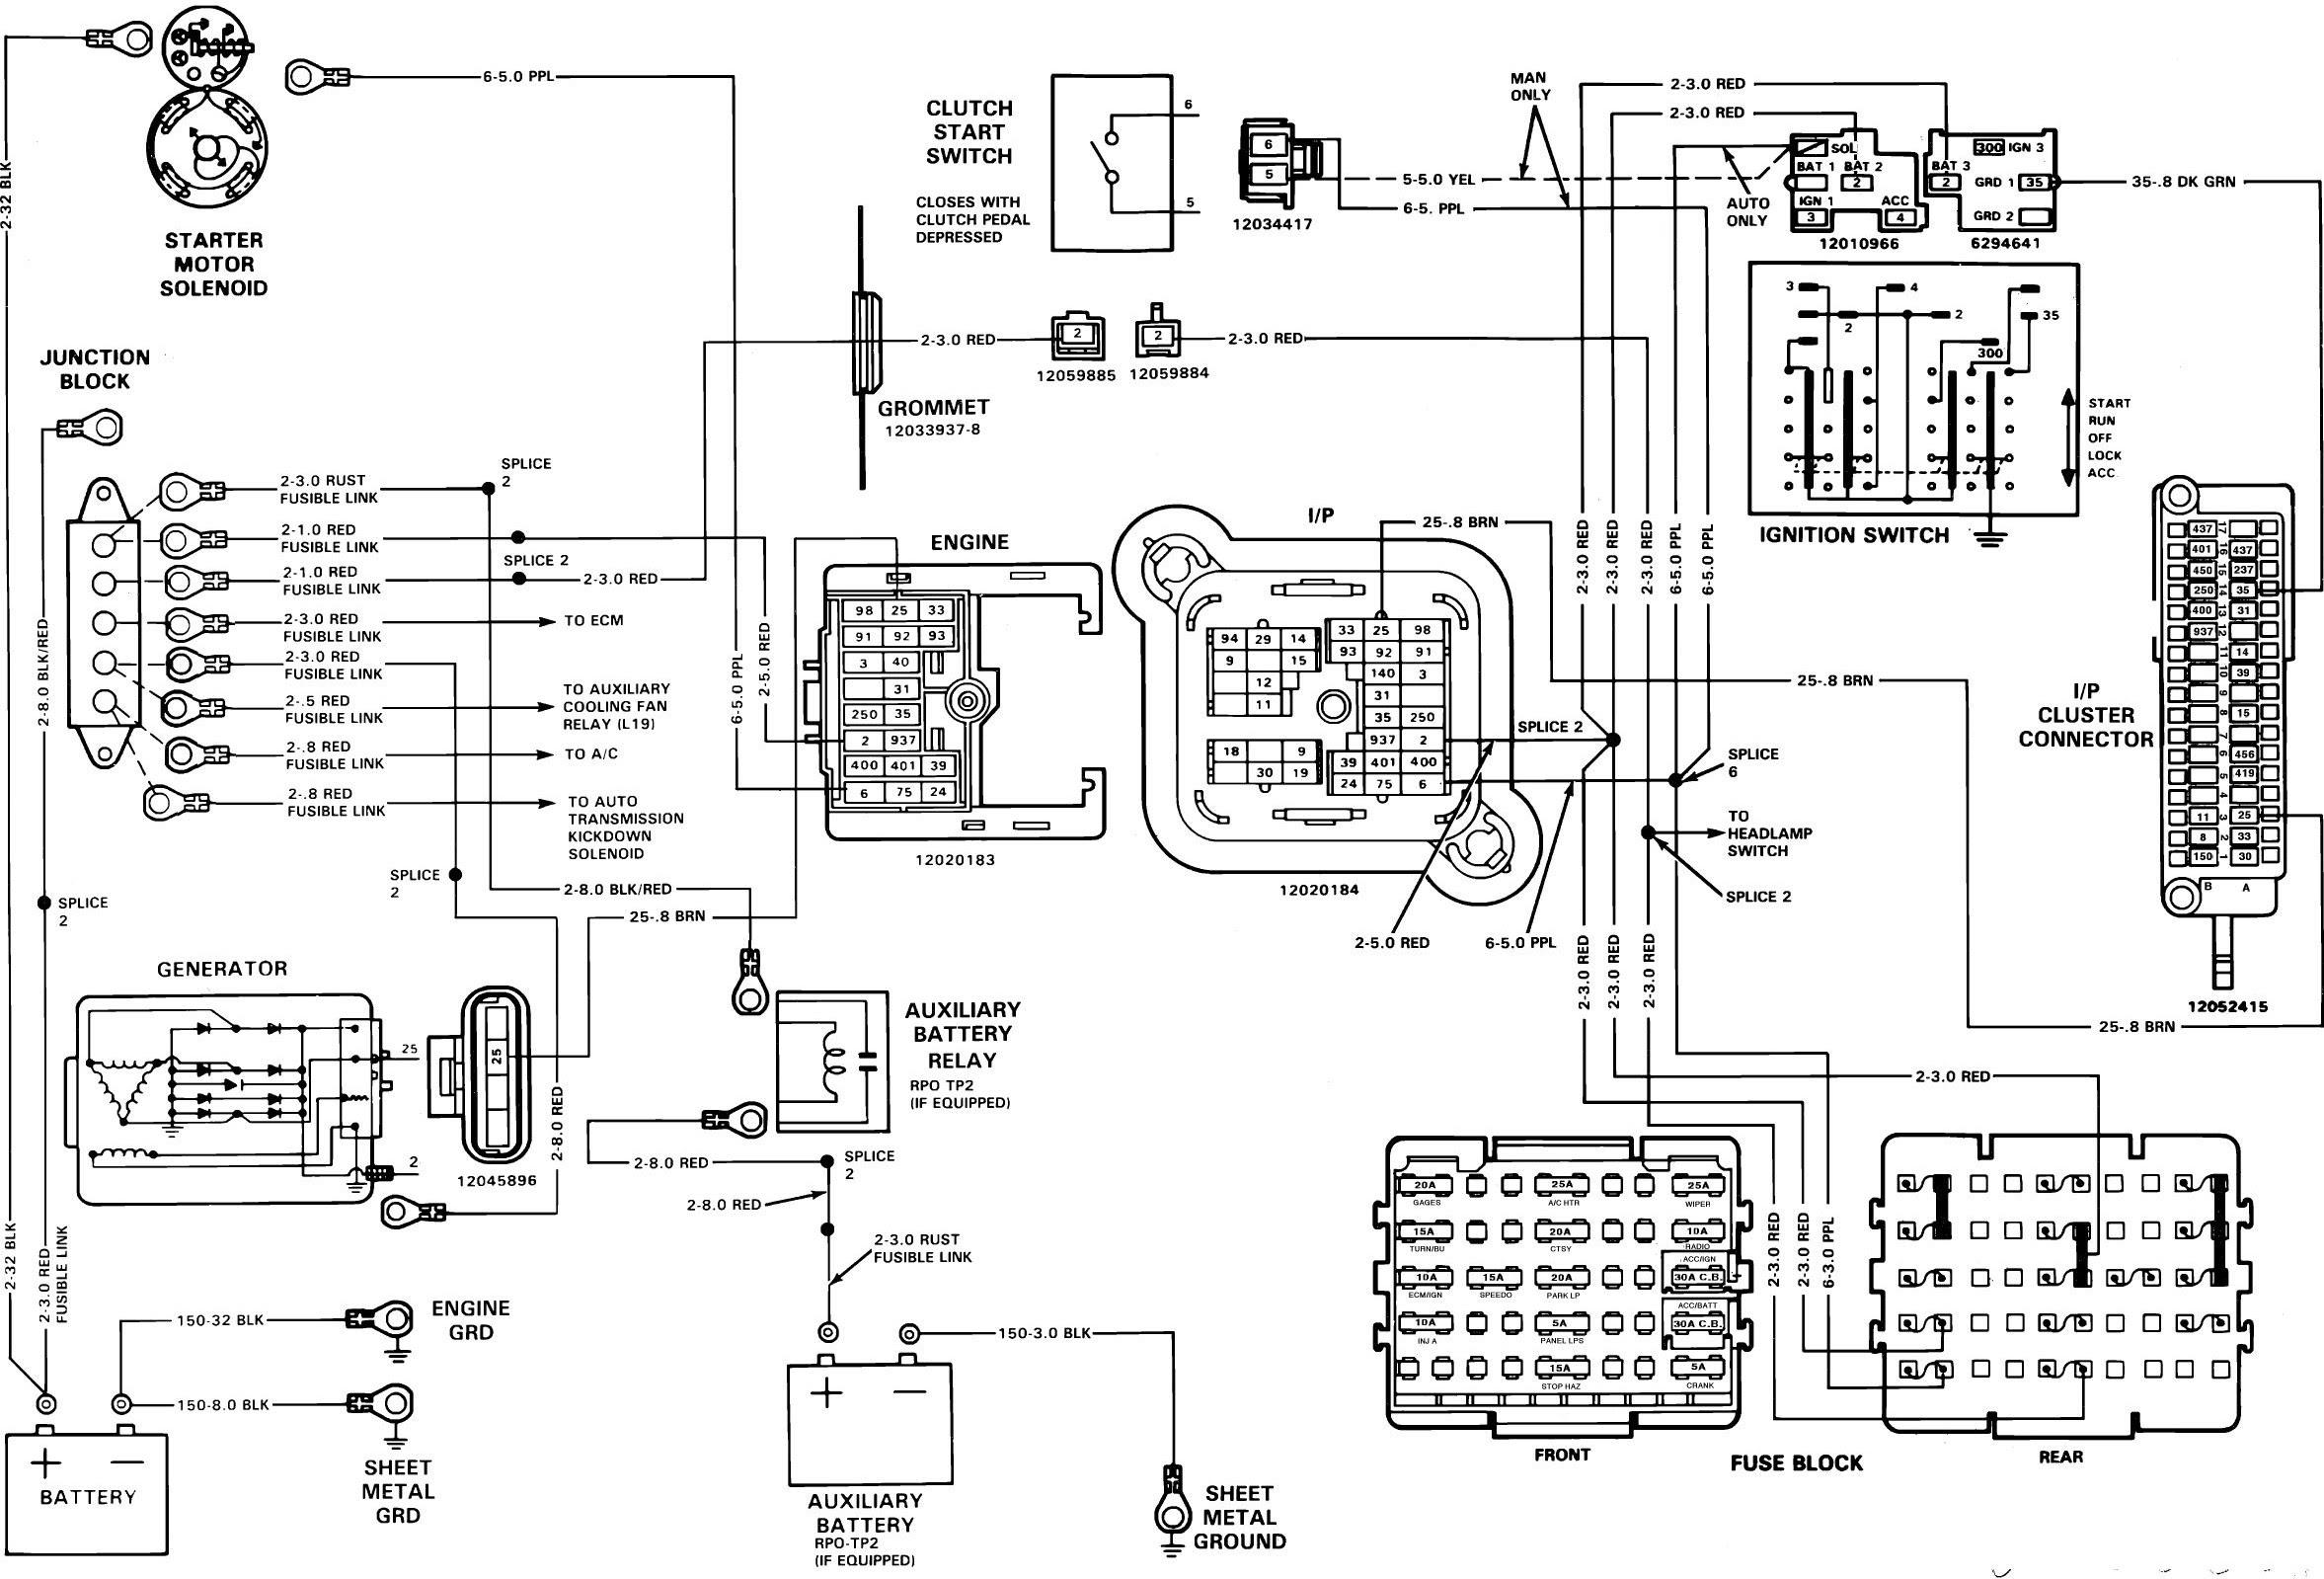 1989 Chevy C1500 Wiring Diagram